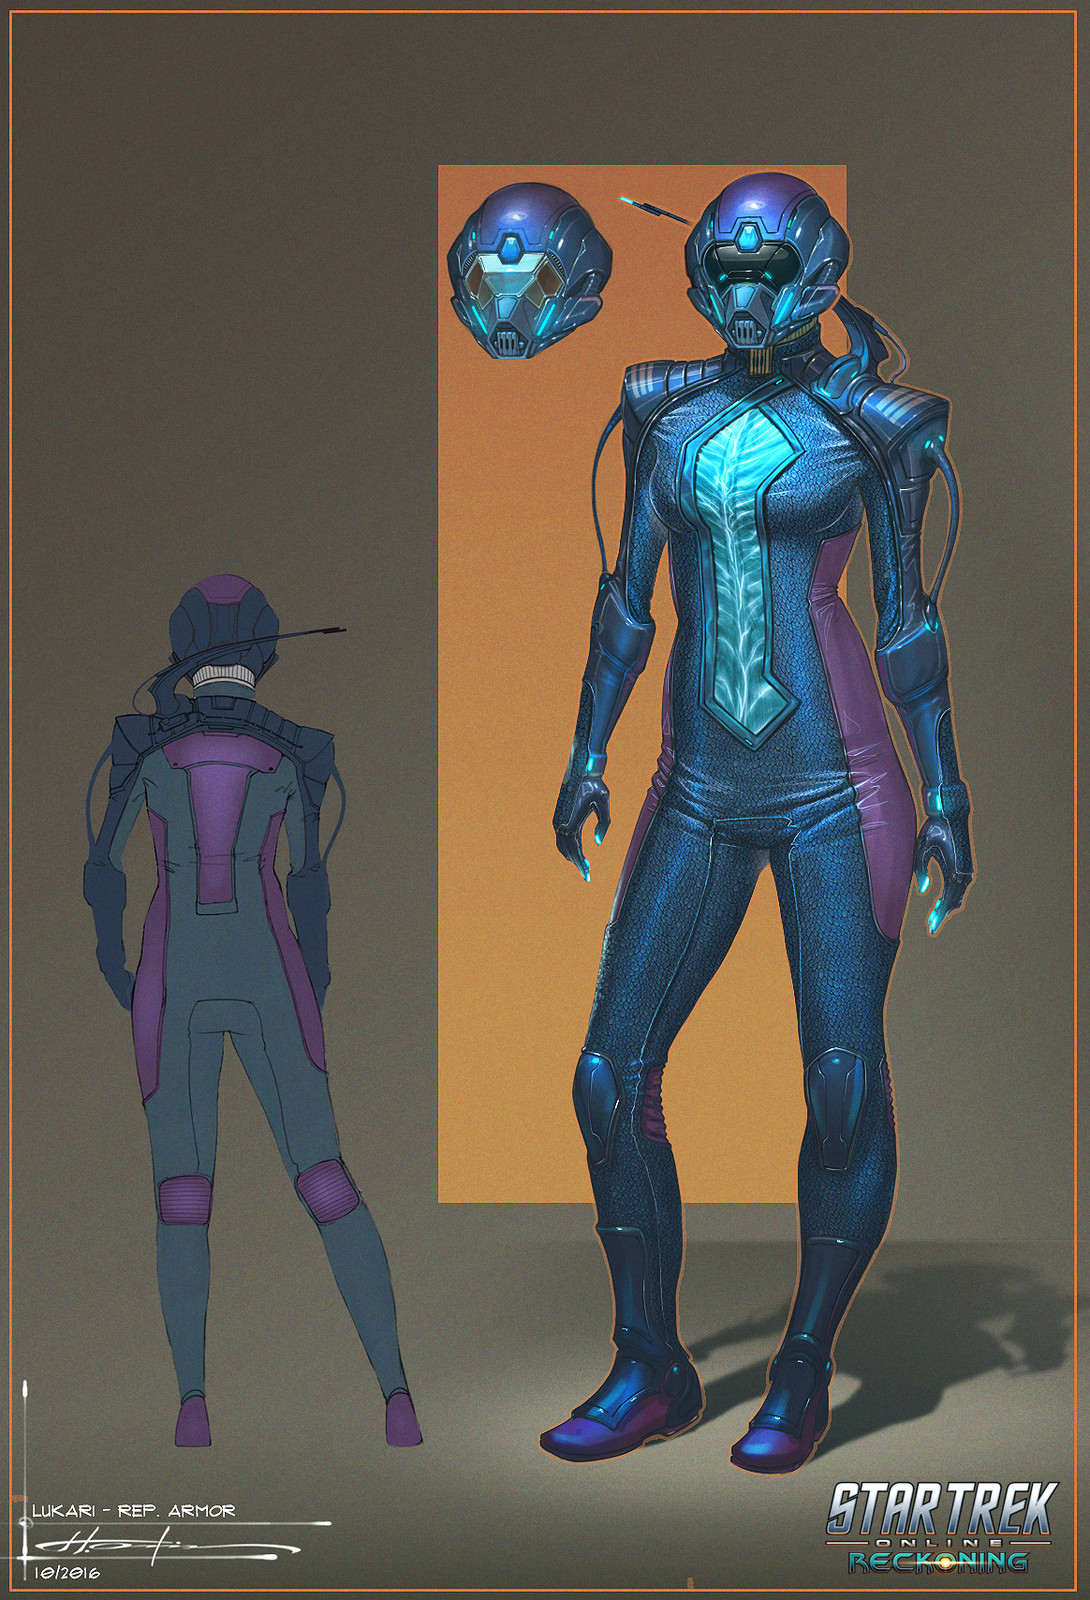 Lukari armor / suit - Star Trek Online